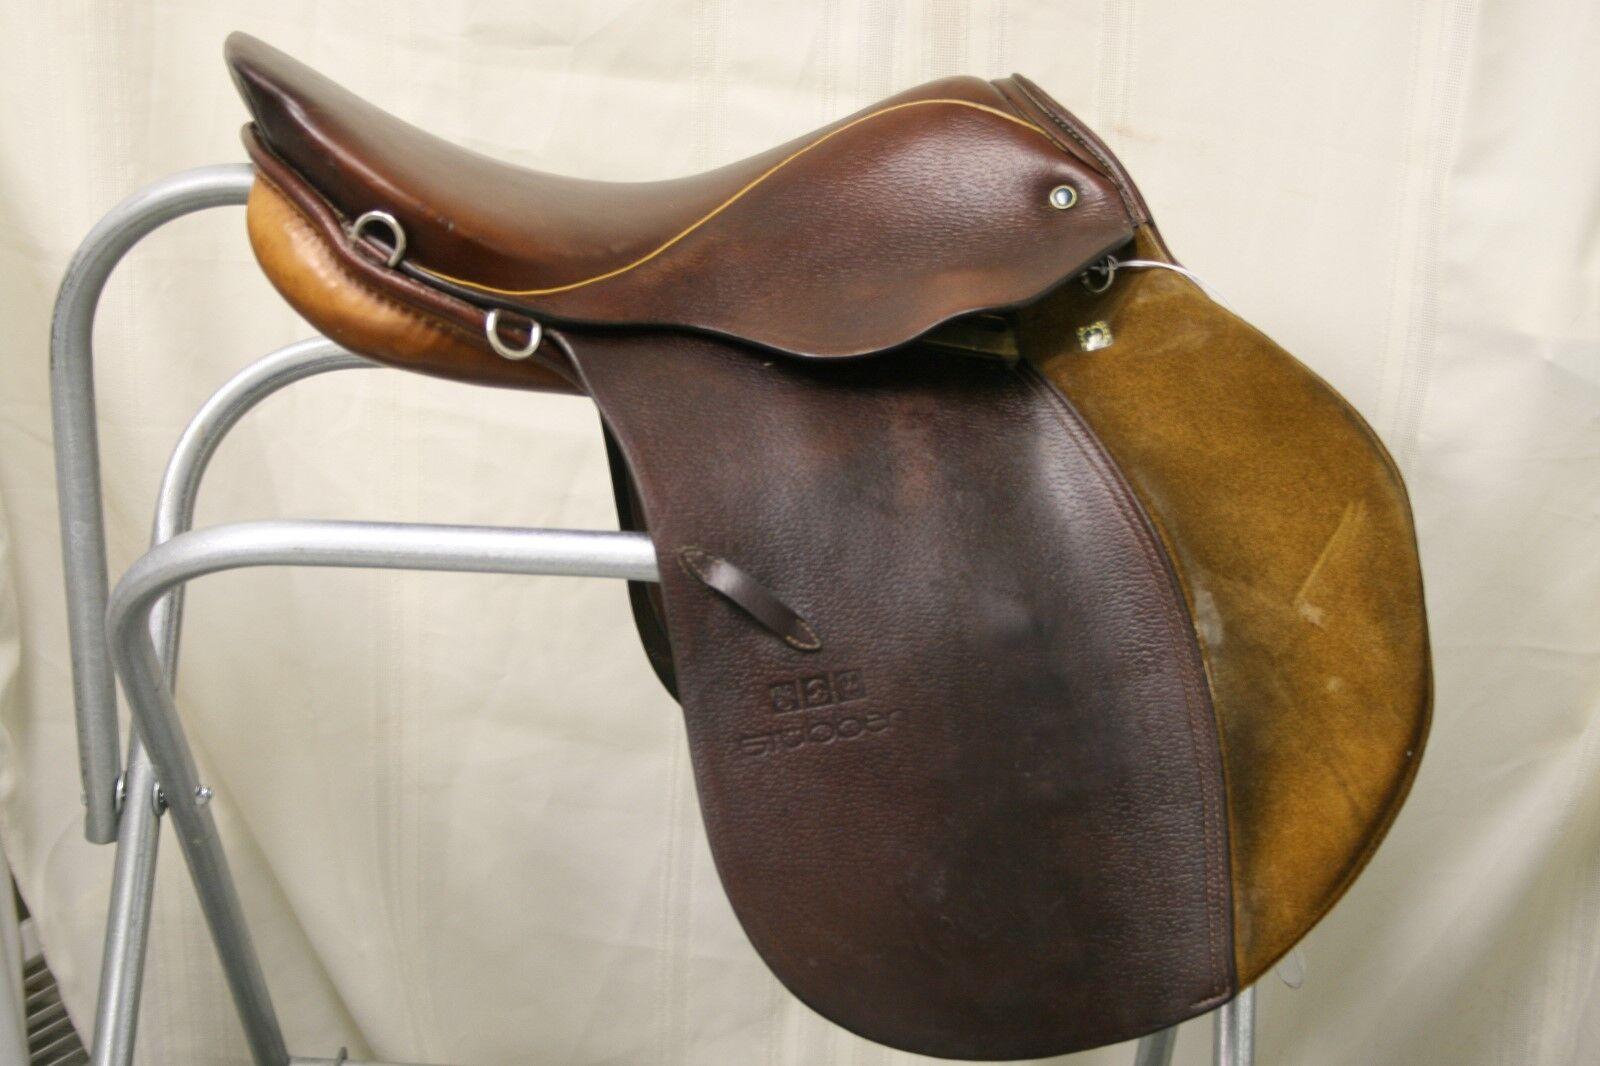 USED Stubben Siegfried CS Saddle  16 12 seat